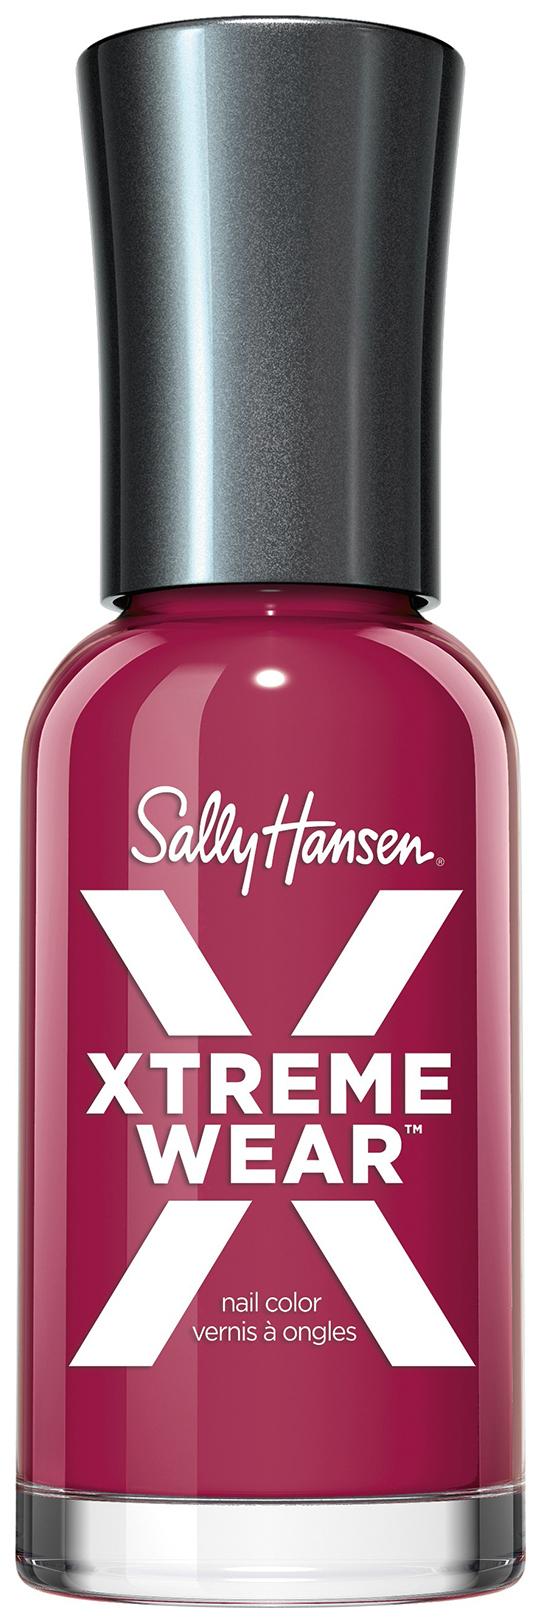 Купить Лак для ногтей Sally Hansen Xtreme Wear Nail Color 586 Feeling Wine 11, 8 мл